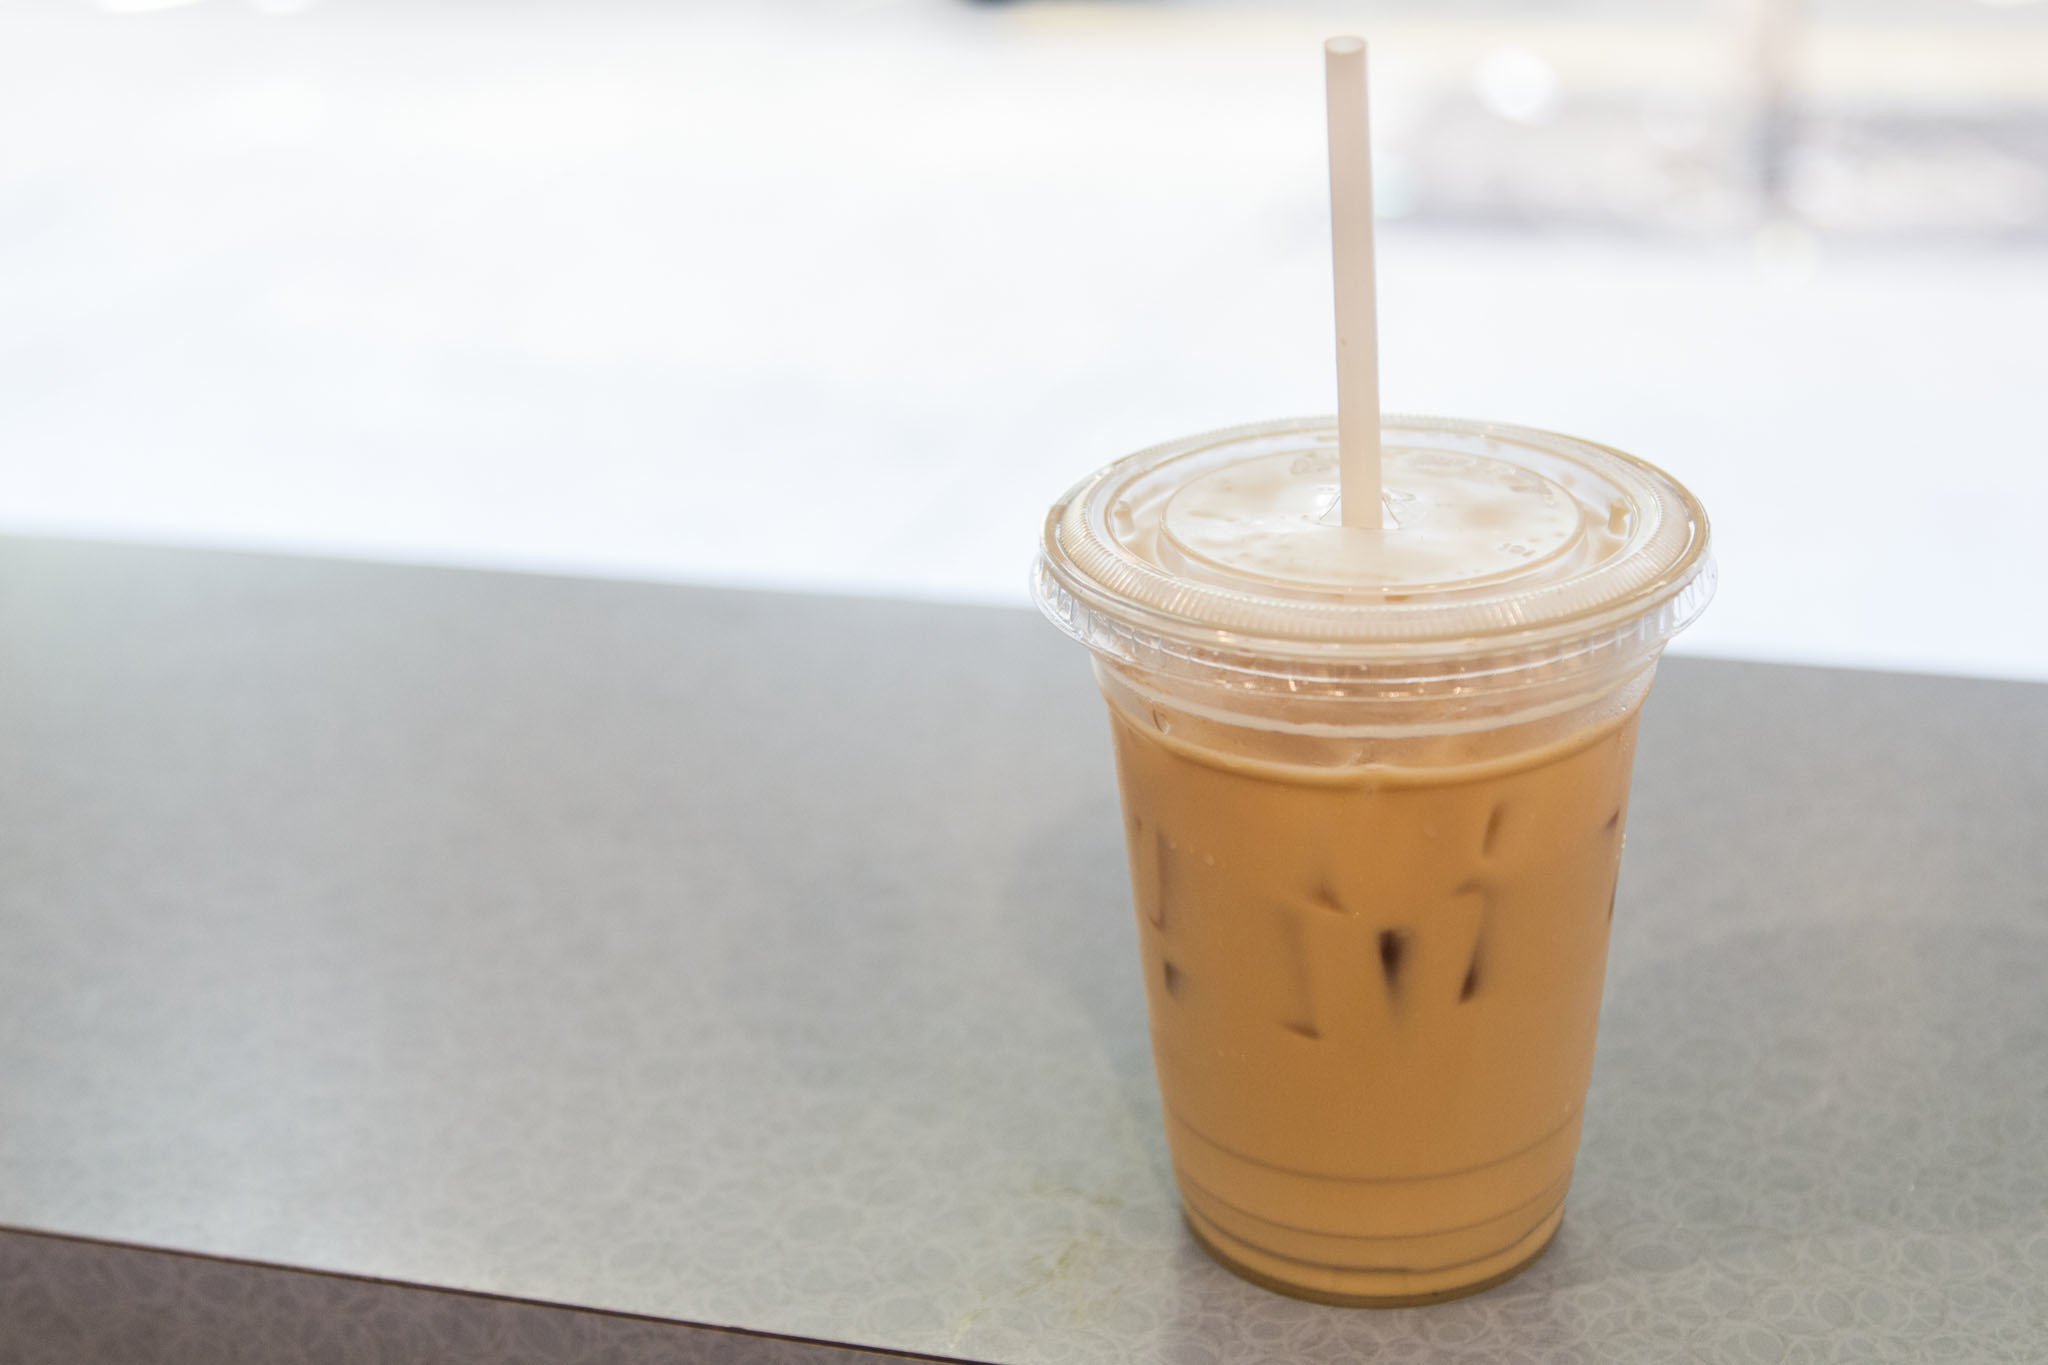 image Loop Coffee Shopsin Chicago